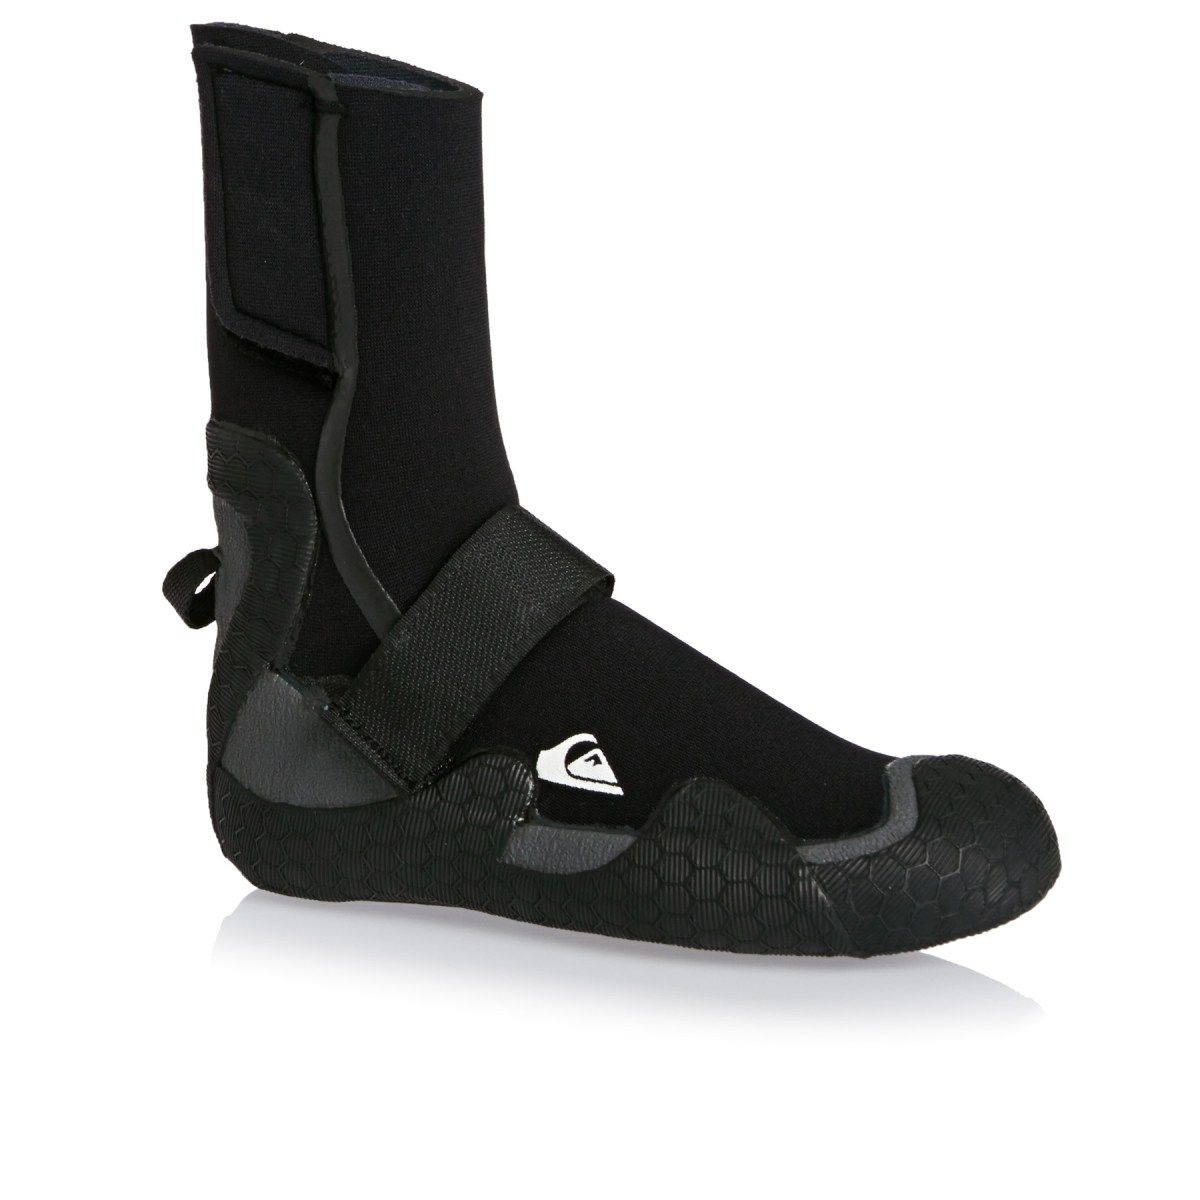 ebc9b57da Quiksilver Wetsuits - Quiksilver Boys Syncro 5mm Round Toe Wetsuit Boots -  Black